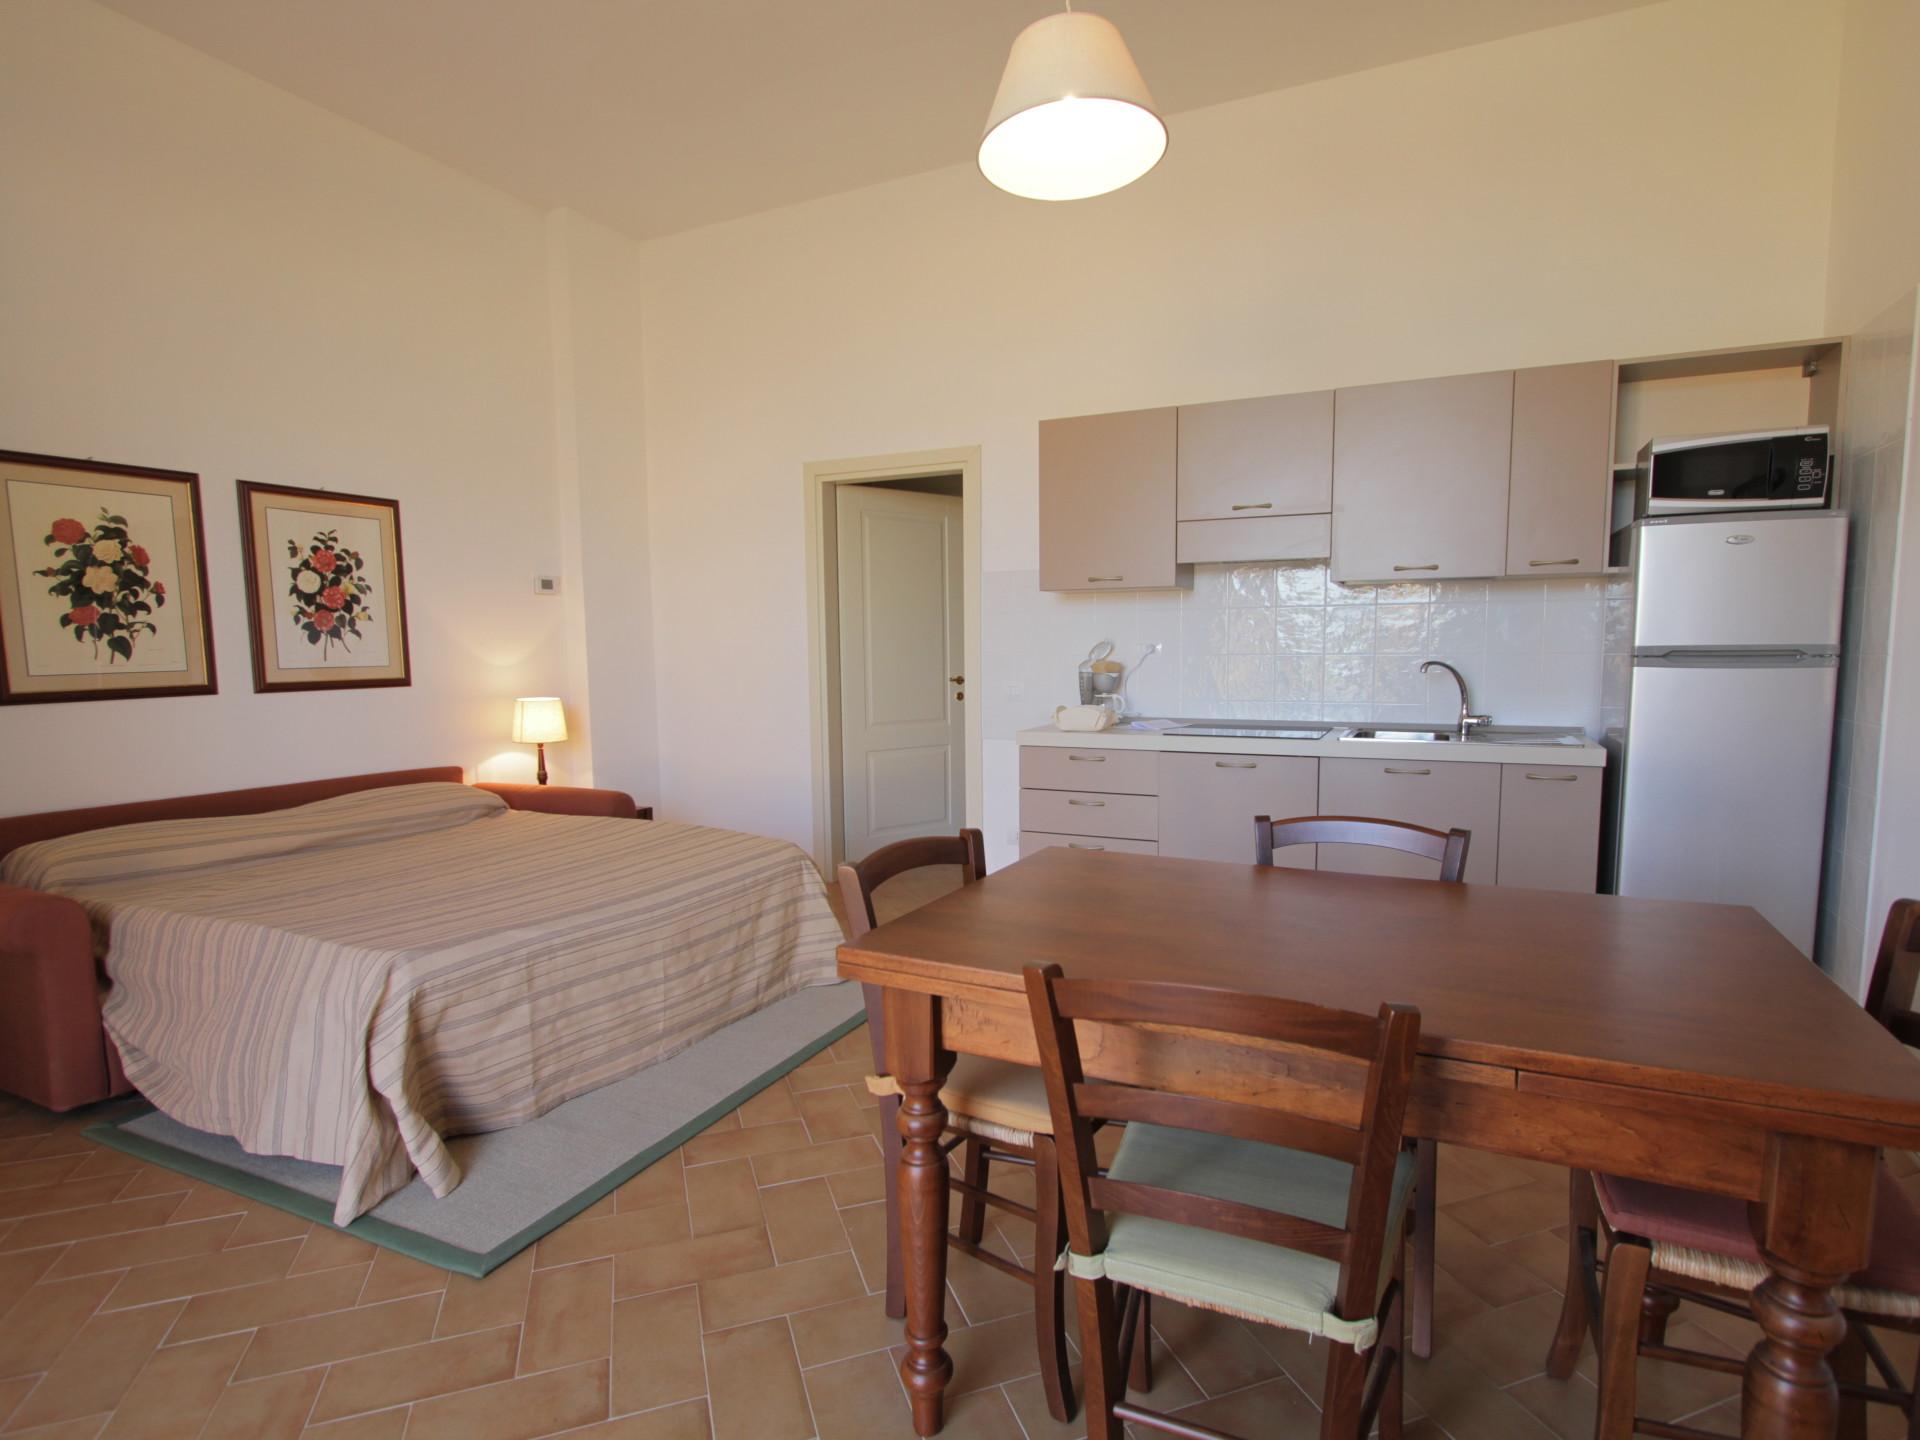 apartmán mono příklad